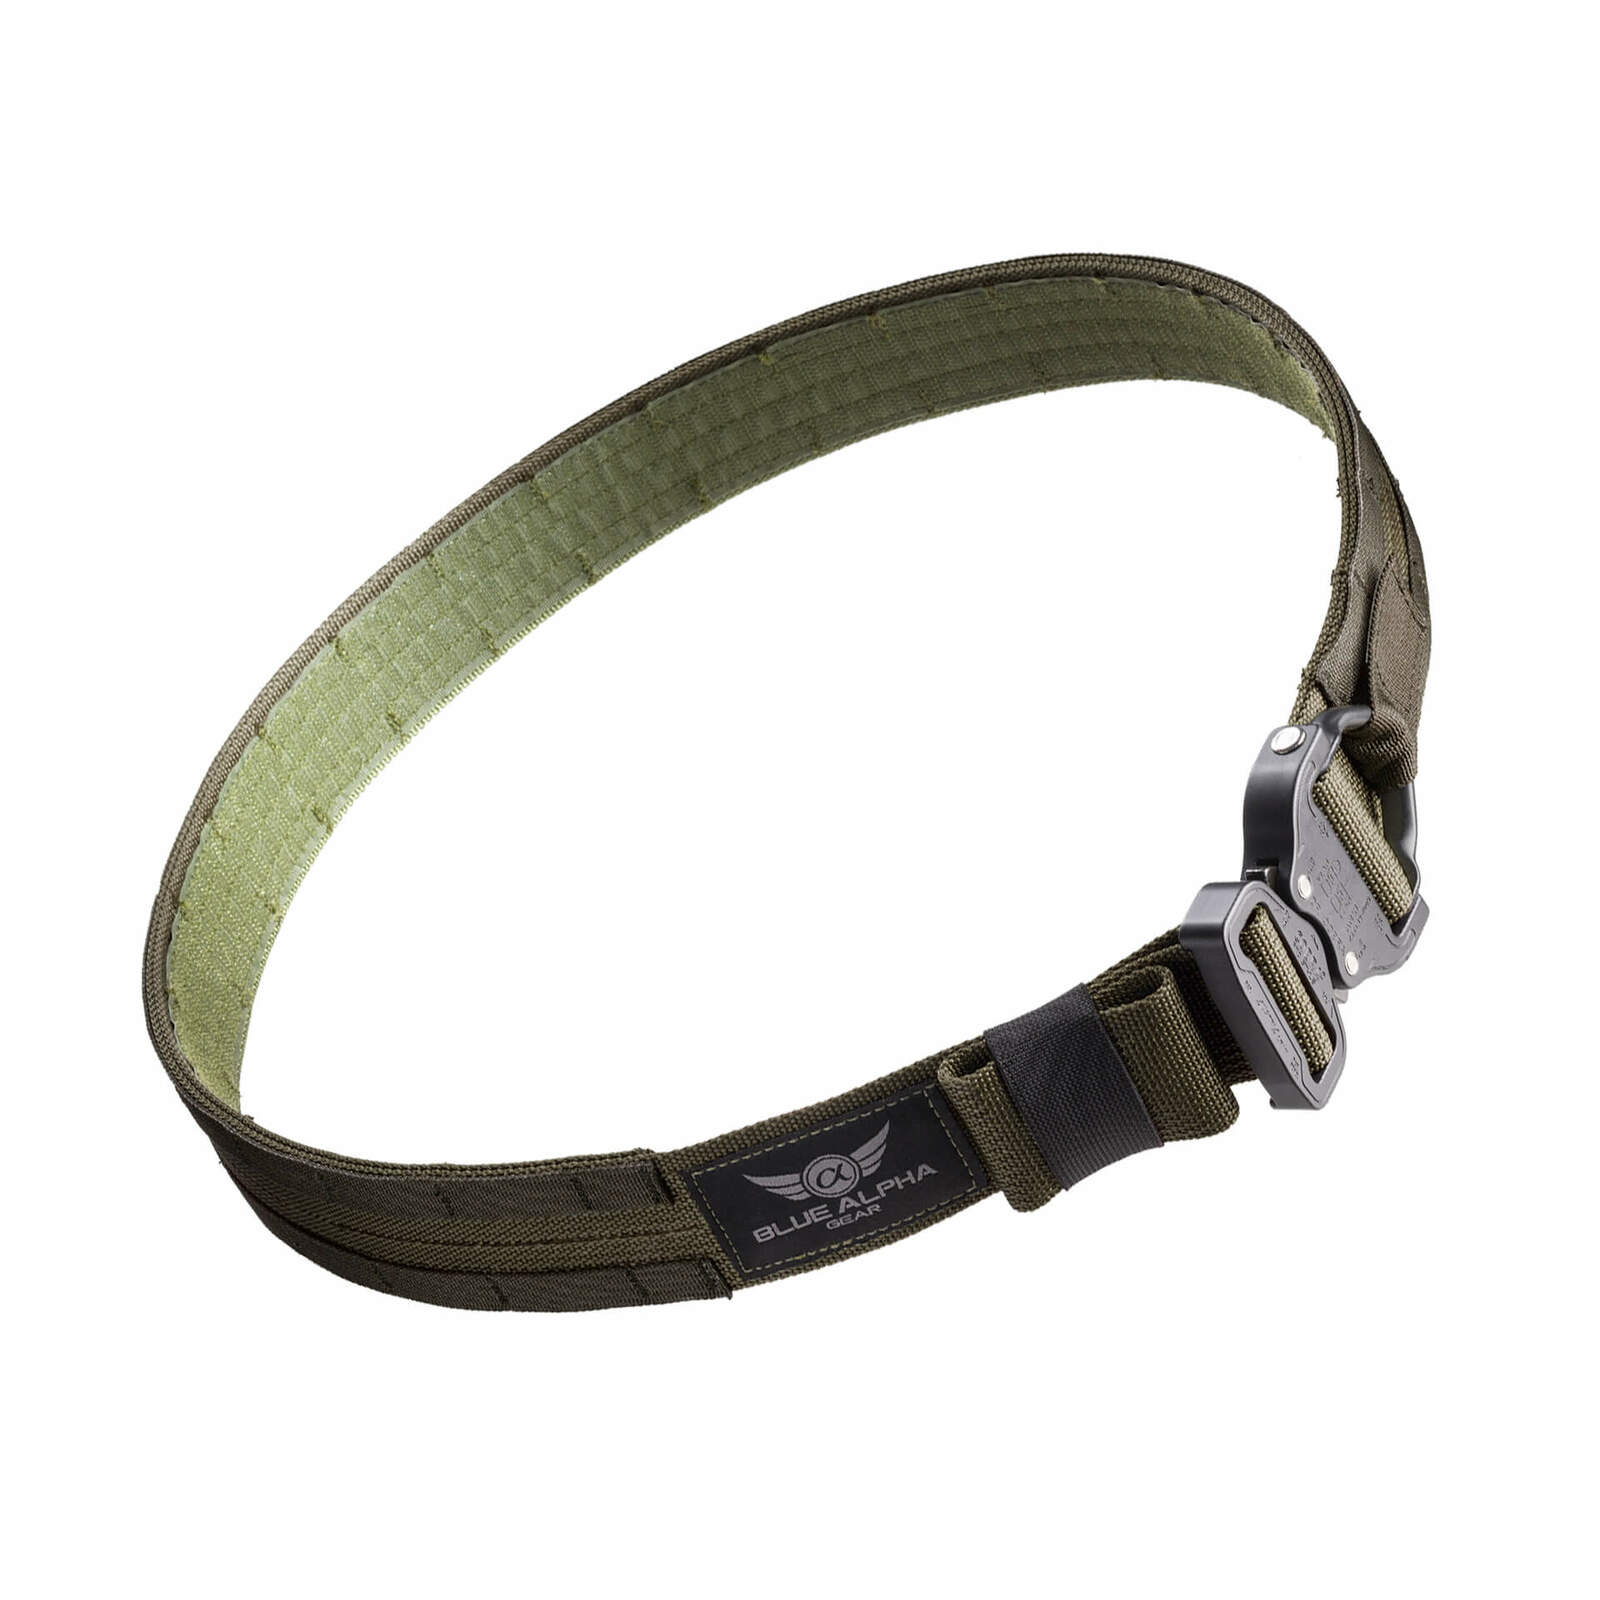 MOLLE 1.75″ Double Belt Rig - Blue Alpha